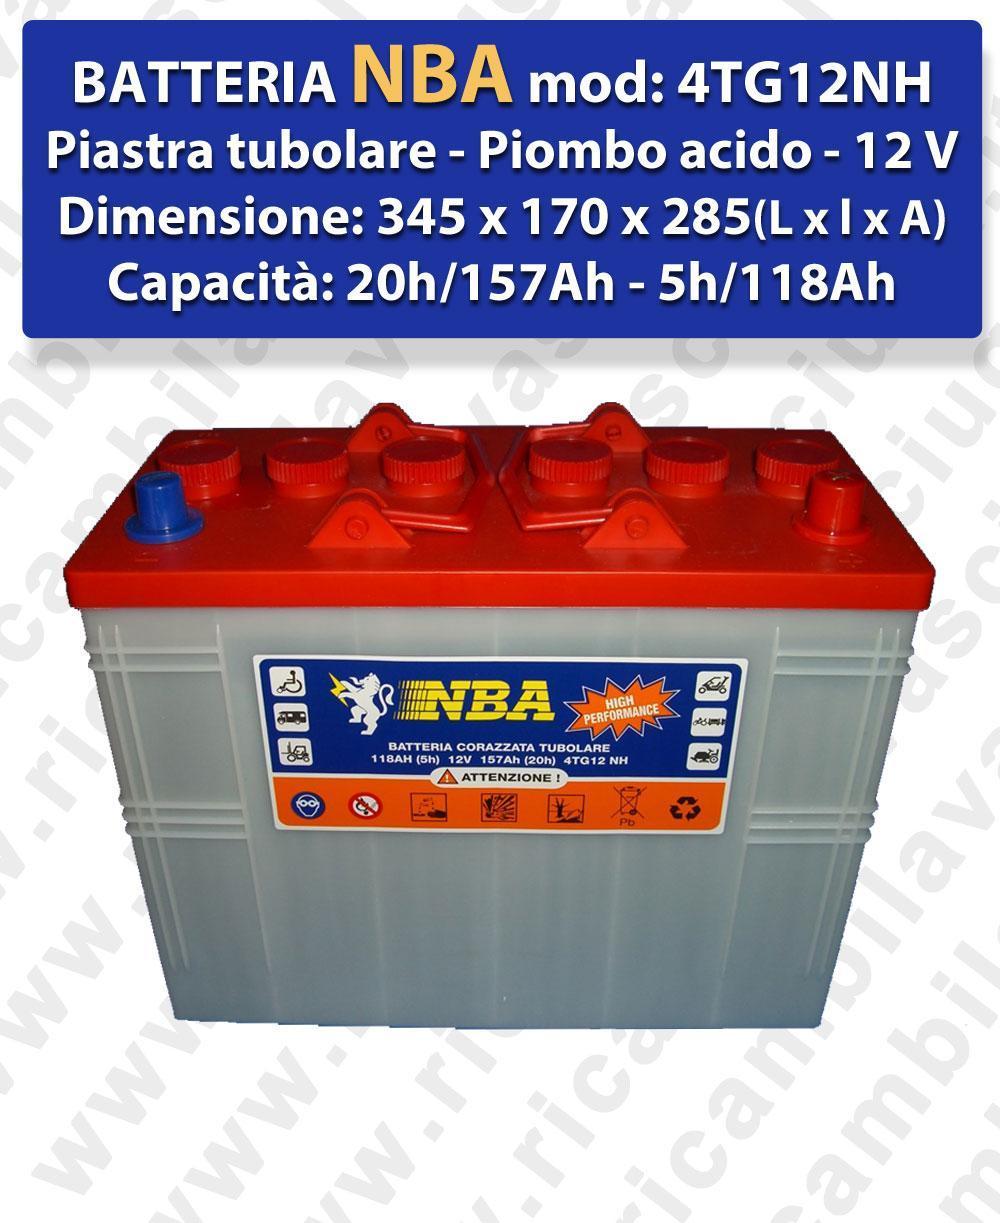 4TG12NH Batteria piombo - NBA 12V 120Ah 20/h